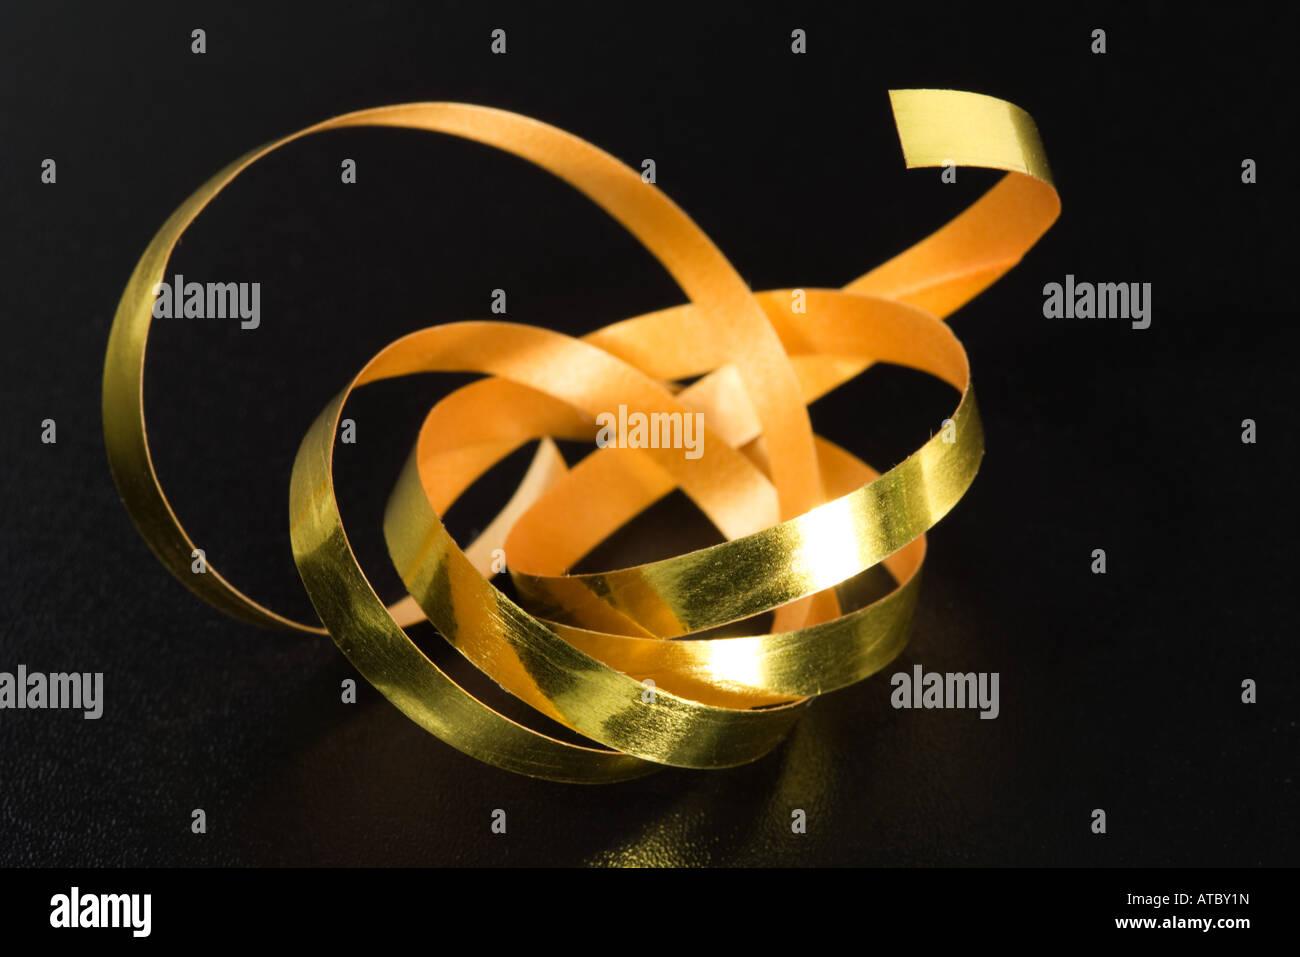 Gold gift-wrap ribbon - Stock Image